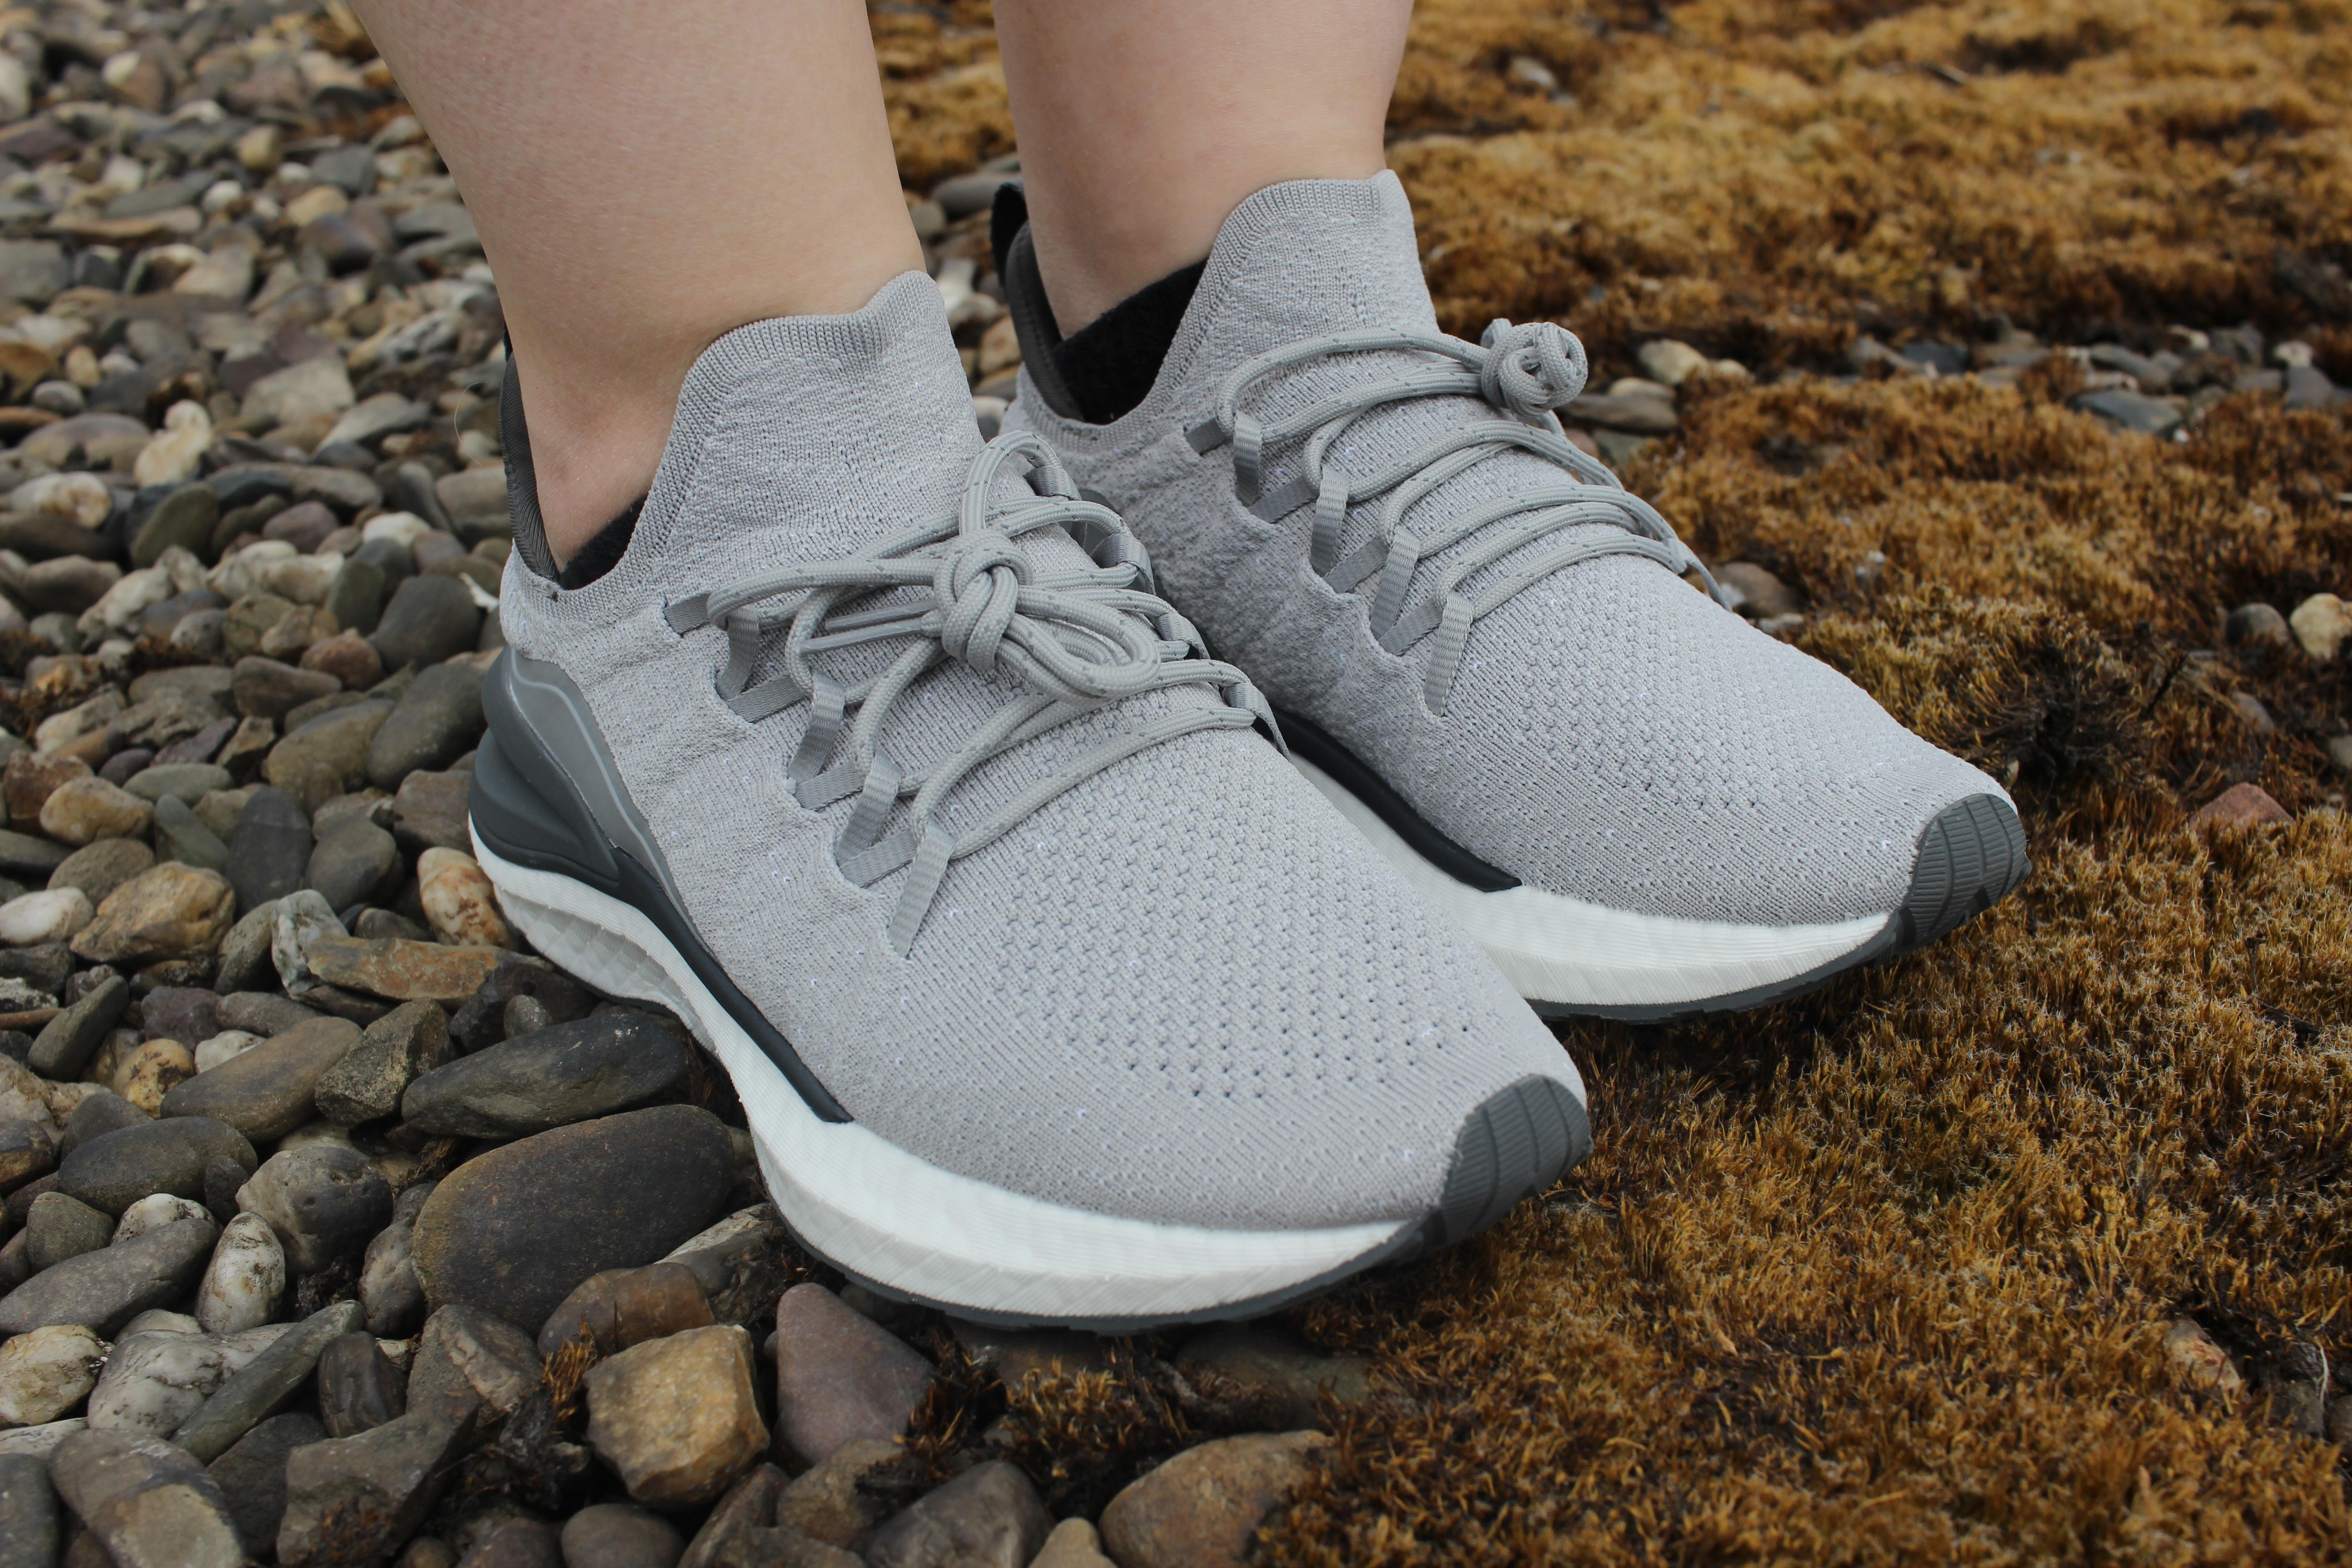 Xiaomi Mijia Fishbone Sneaker 4: Adidas